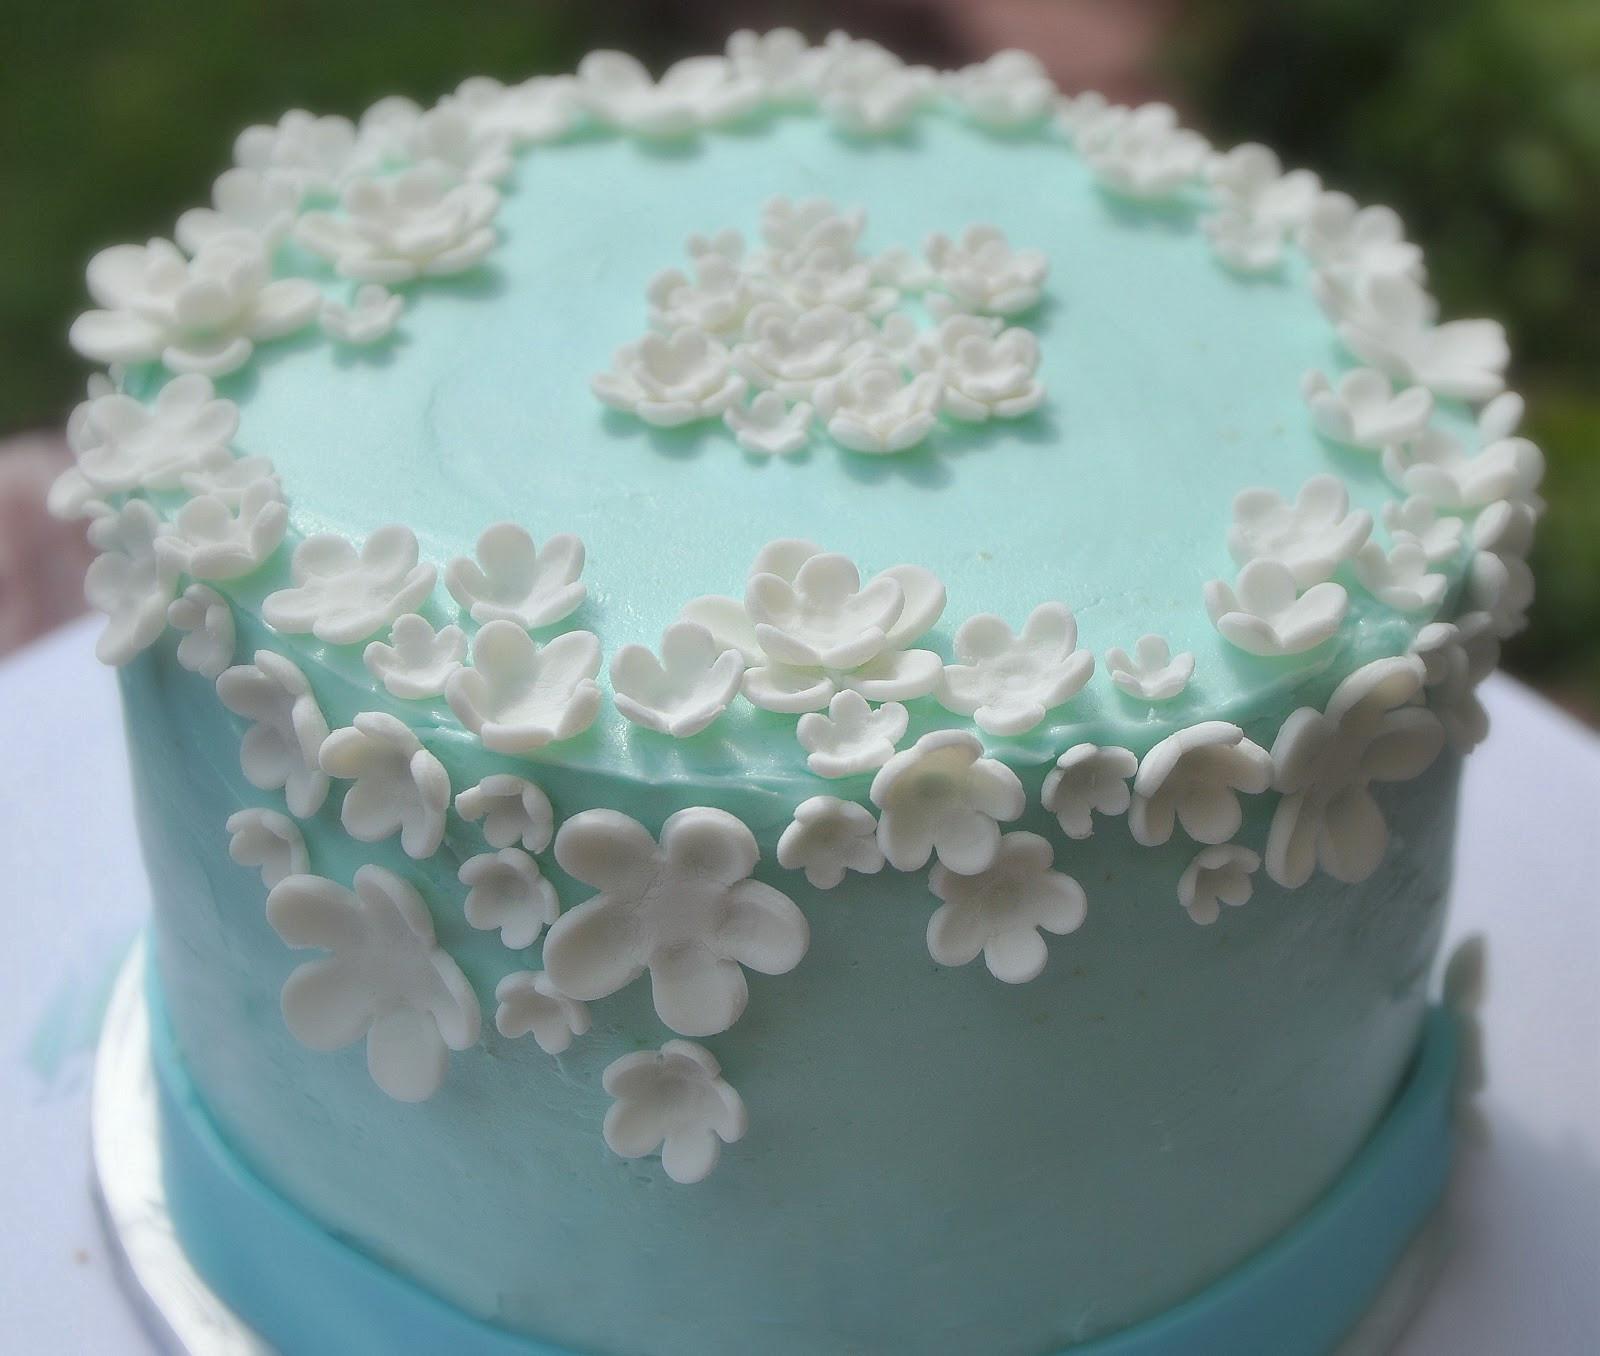 Best ideas about Birthday Cake Flowers . Save or Pin TurtleCraftyGirl Flower Birthday Cake Now.